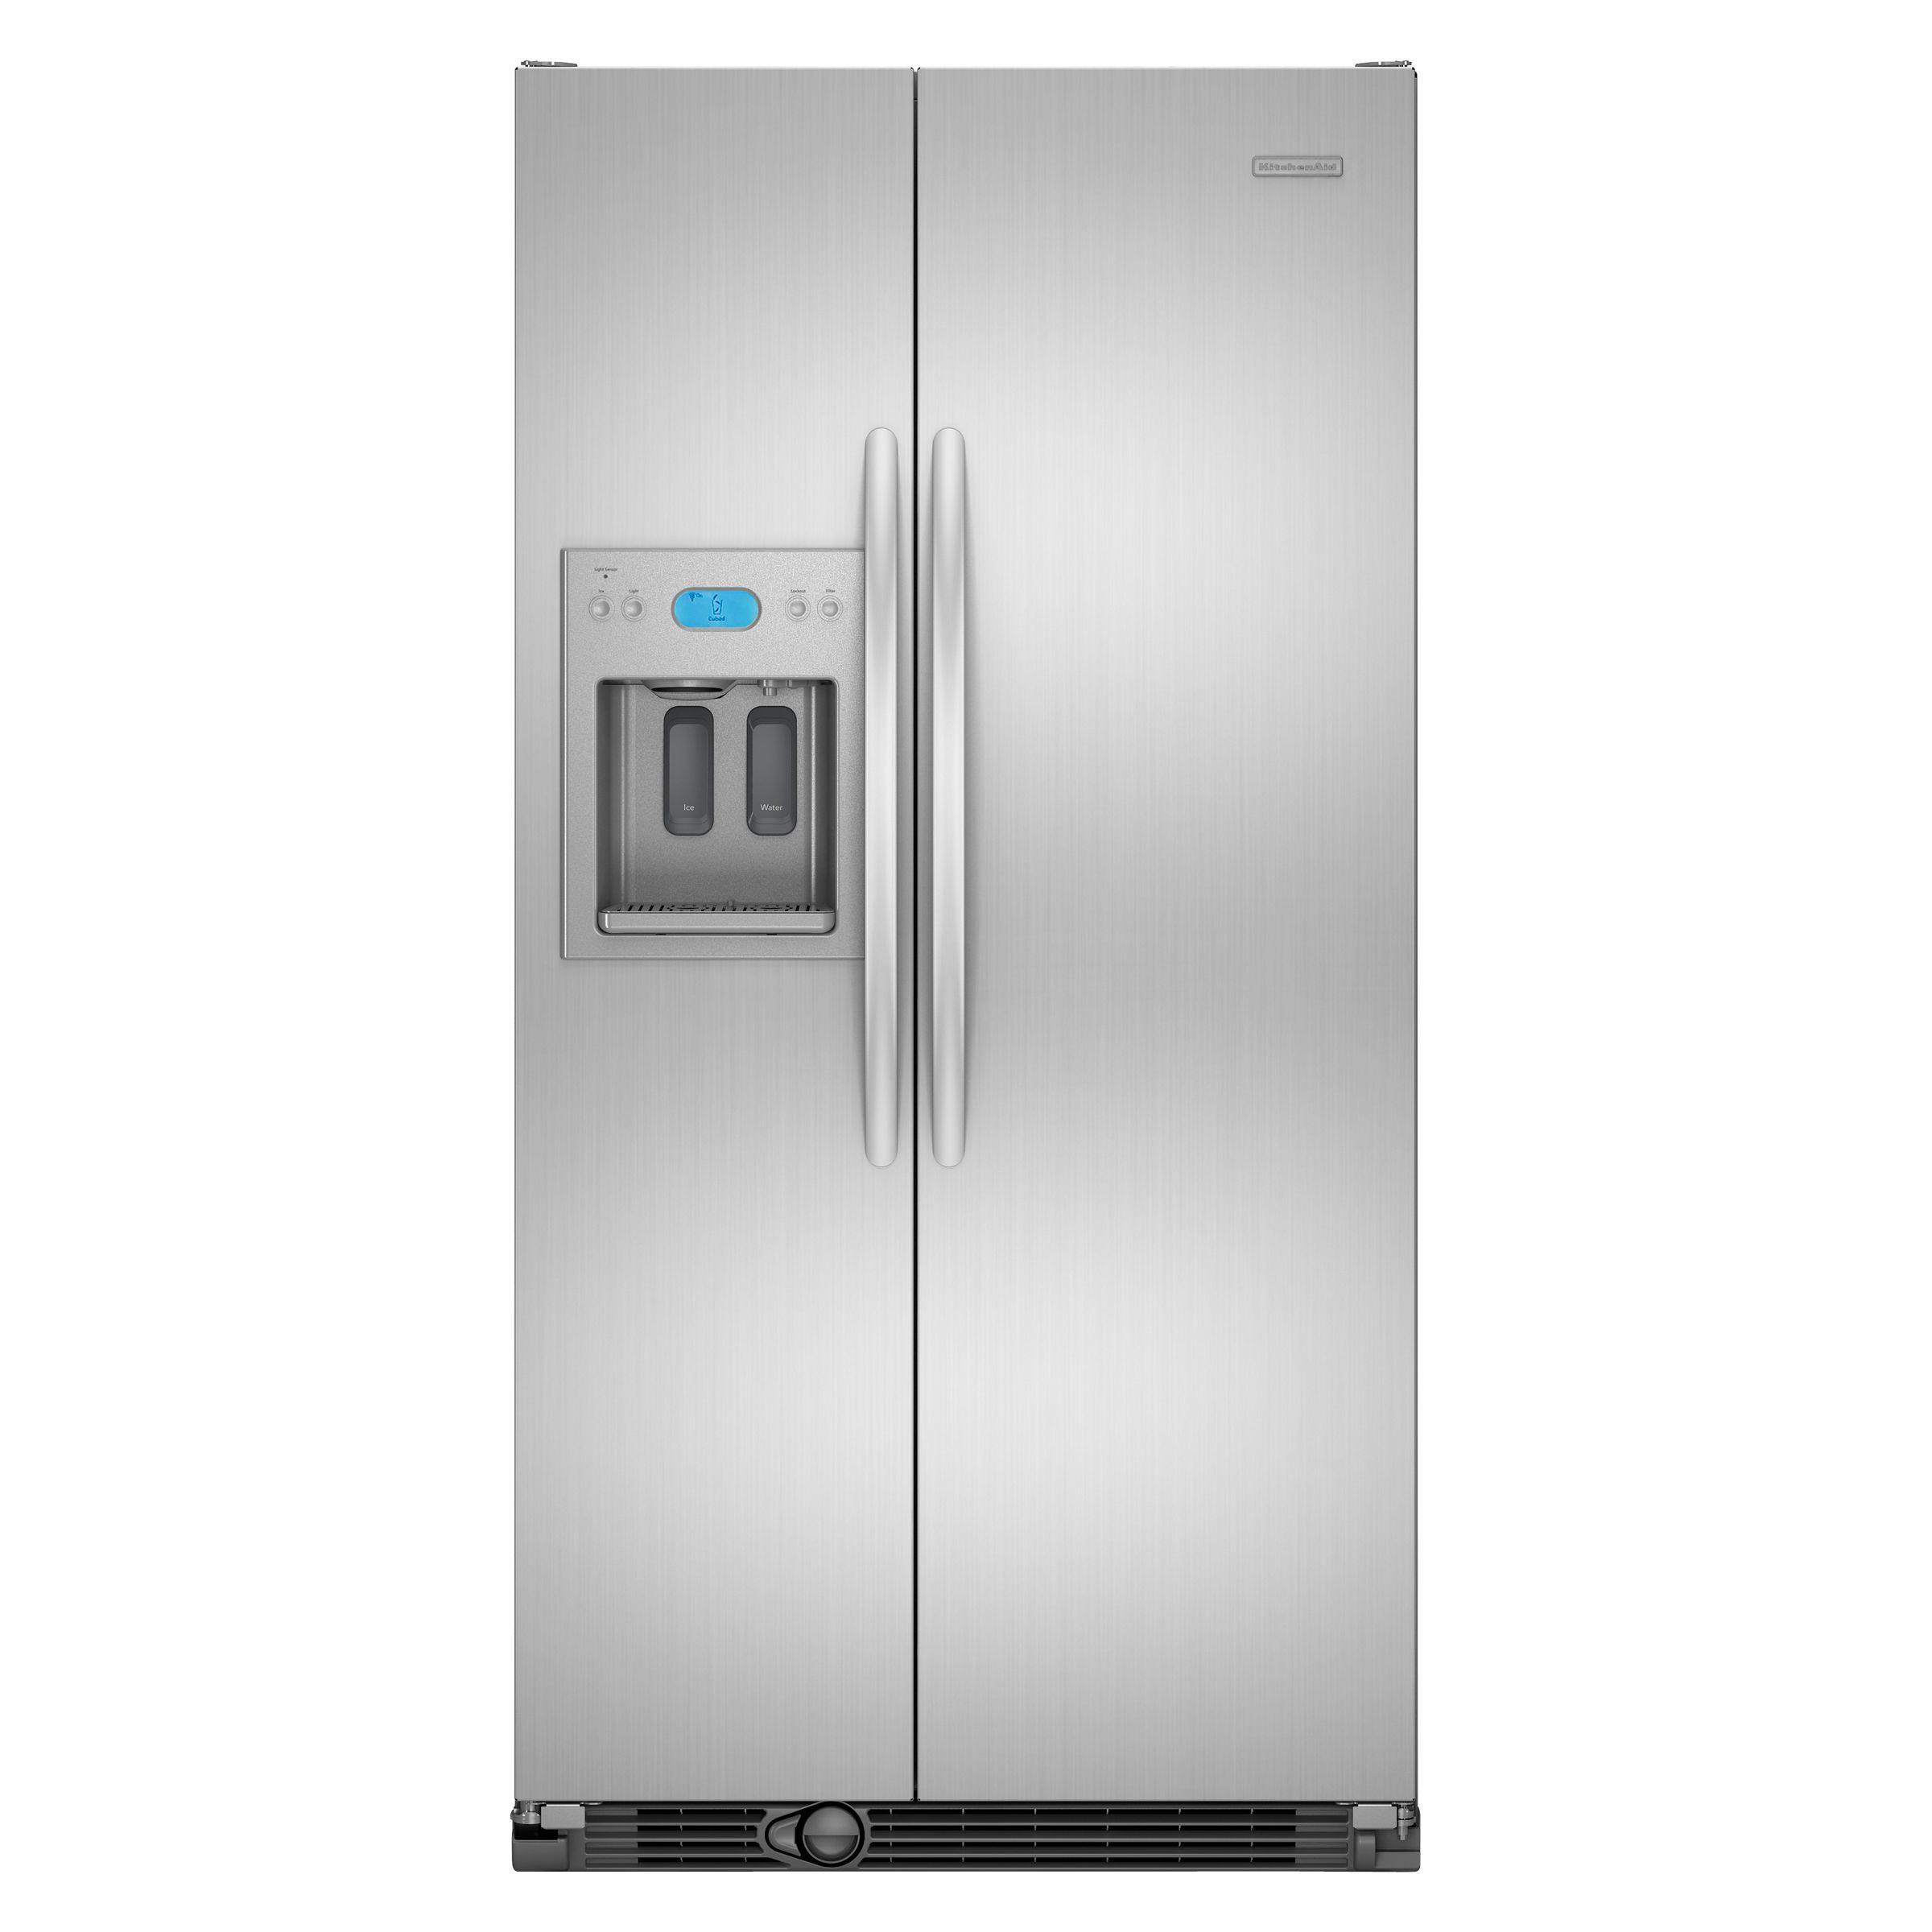 Kitchenaid Refrigerator kitchenaid refrigerator parts | model kscs25fvms02 | sears partsdirect